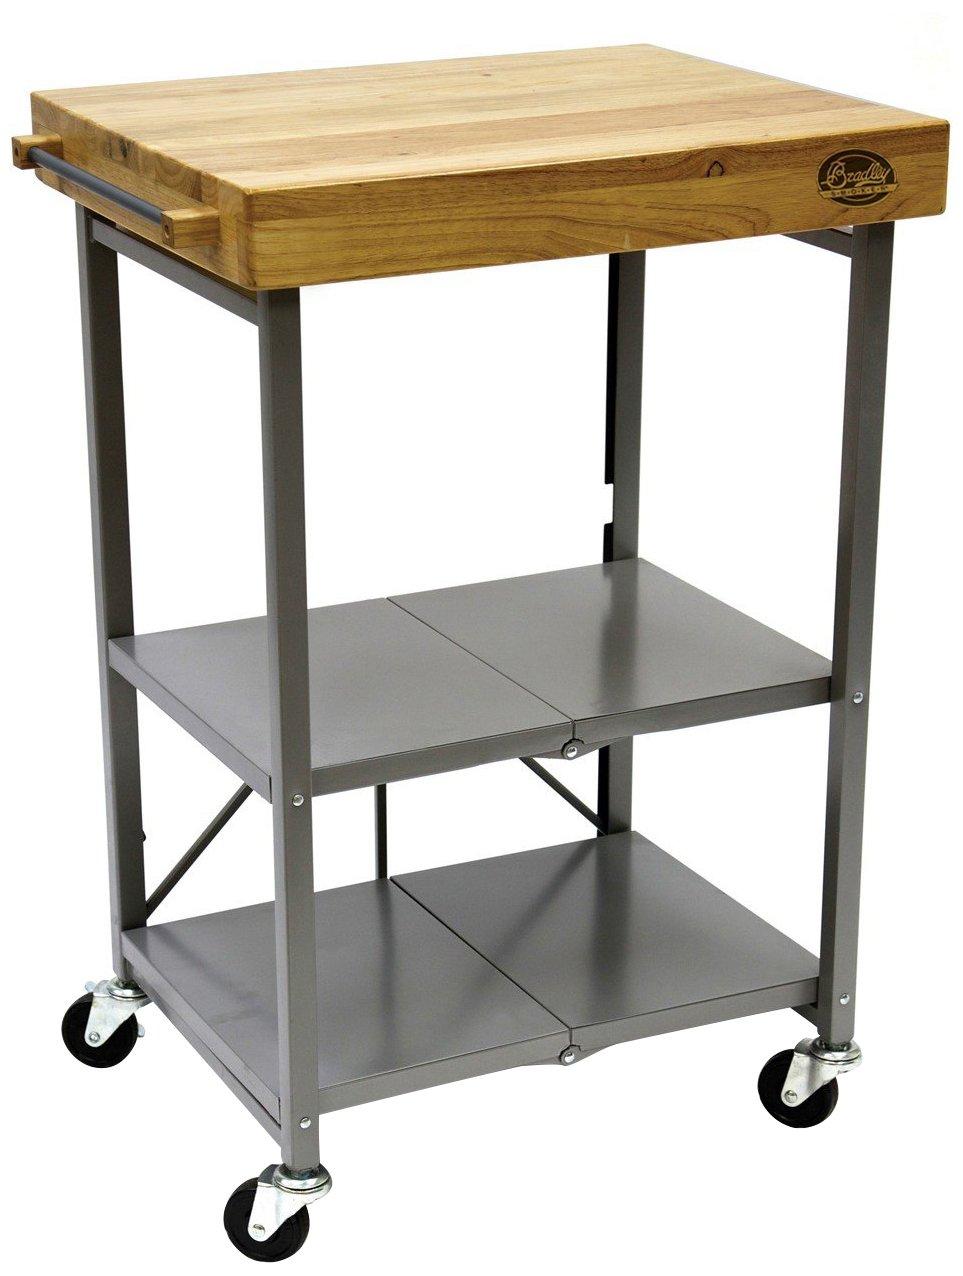 Bradley Smoker Foldable Kitchen Cart, Transitional